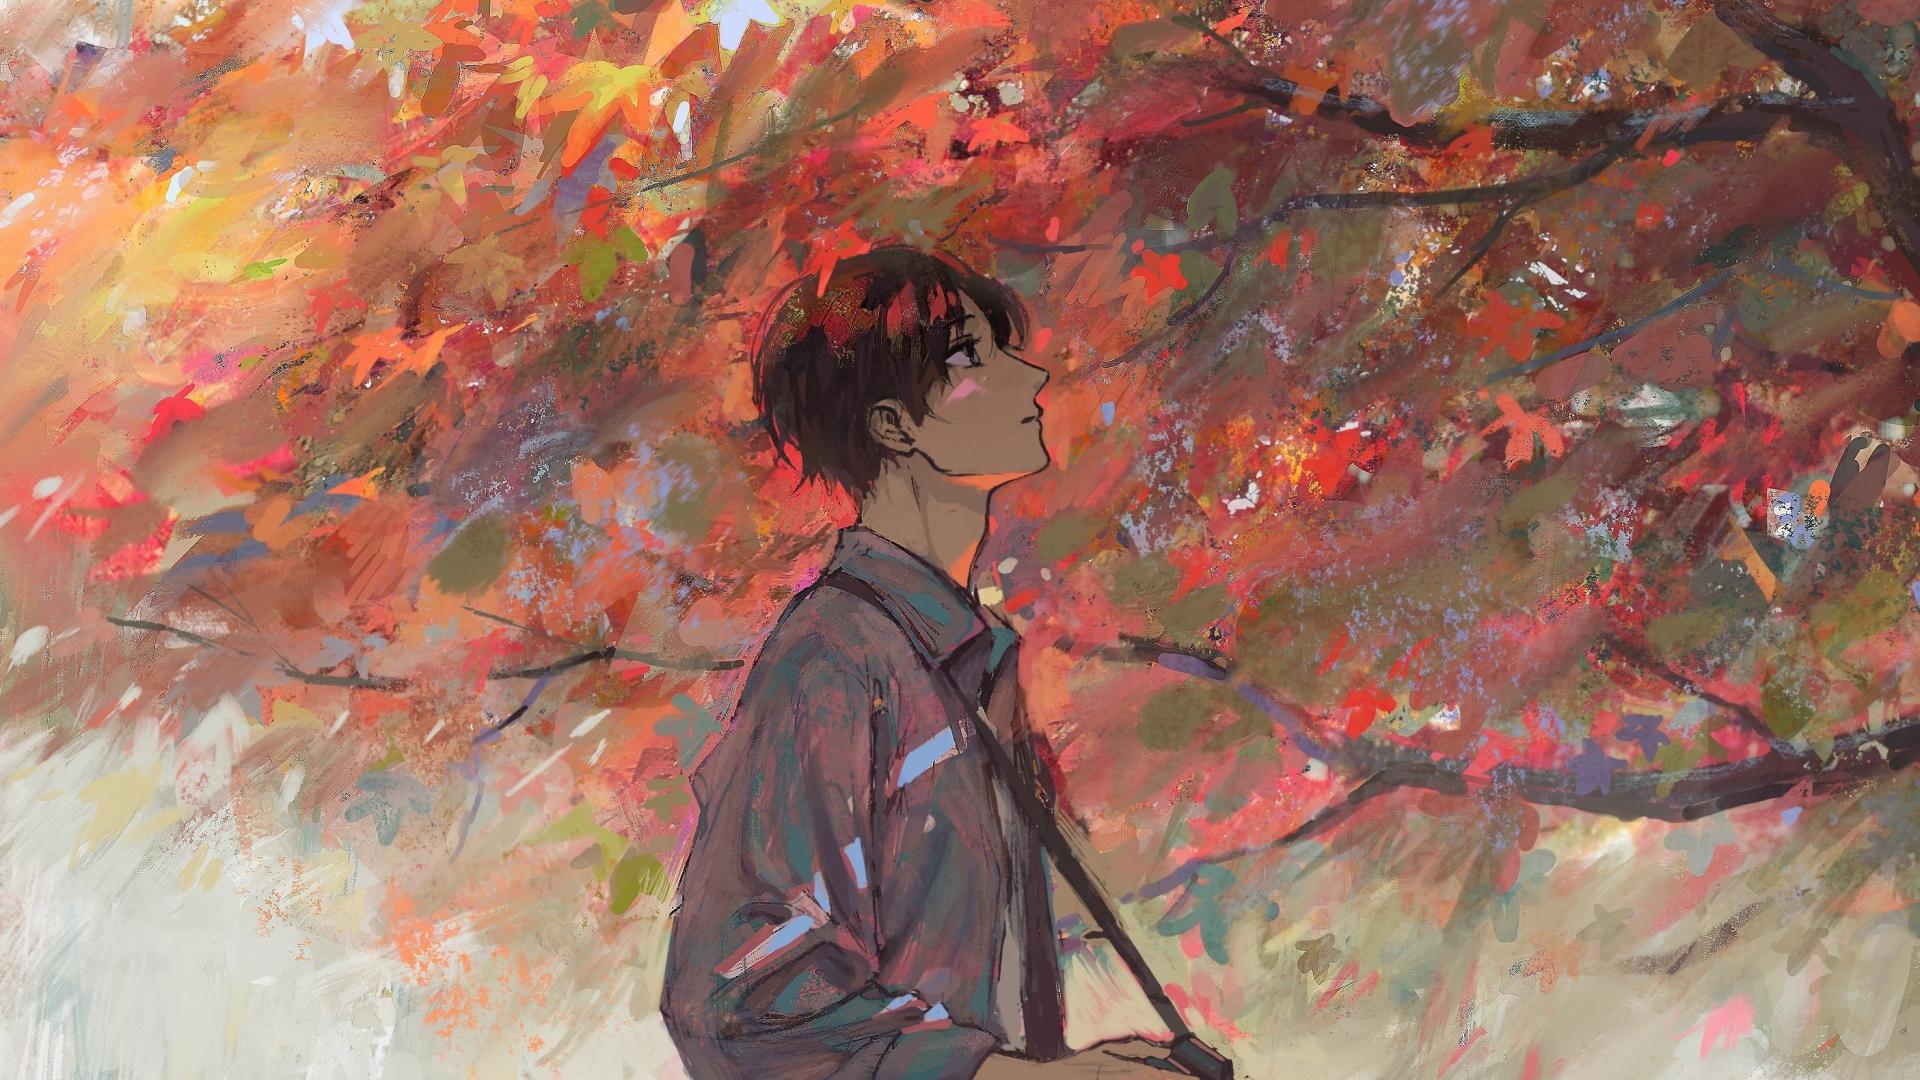 Download 1920x1080 wallpaper anime boy, autumn, tree, artwork, full hd, hdtv, fhd, 1080p ...